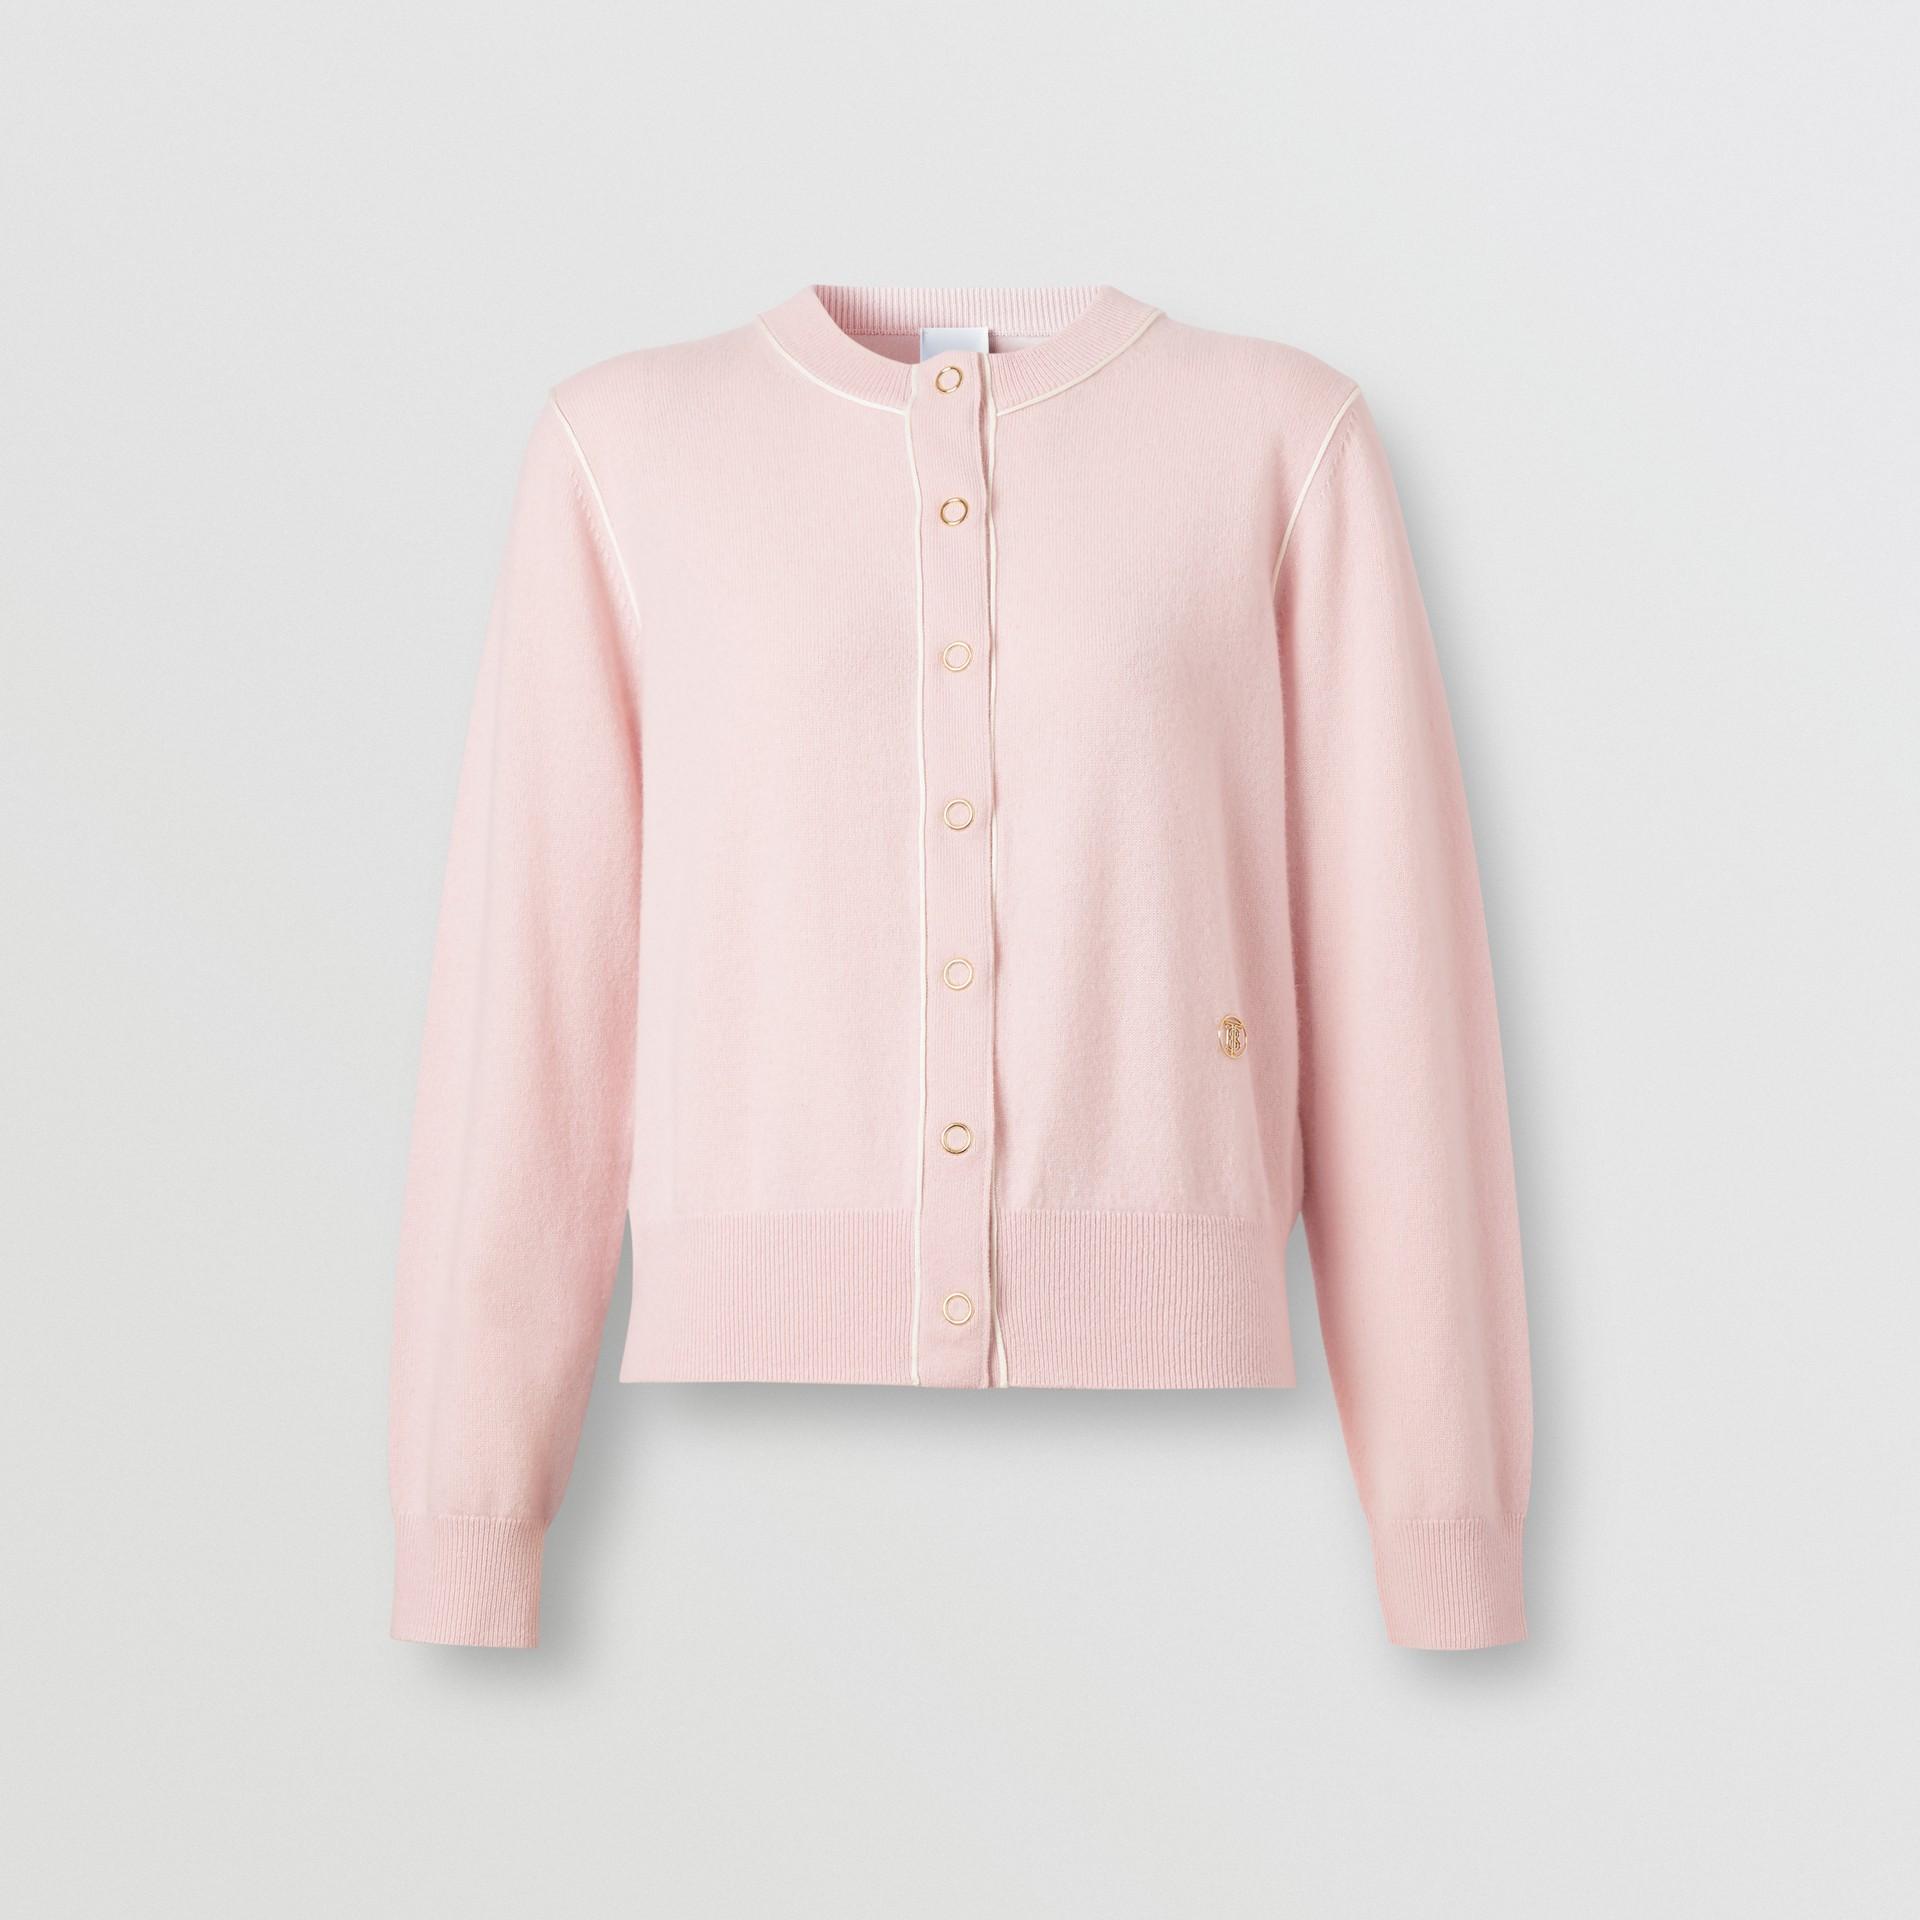 Silk Trim Monogram Motif Cashmere Cardigan in Copper Pink - Women | Burberry United Kingdom - gallery image 3